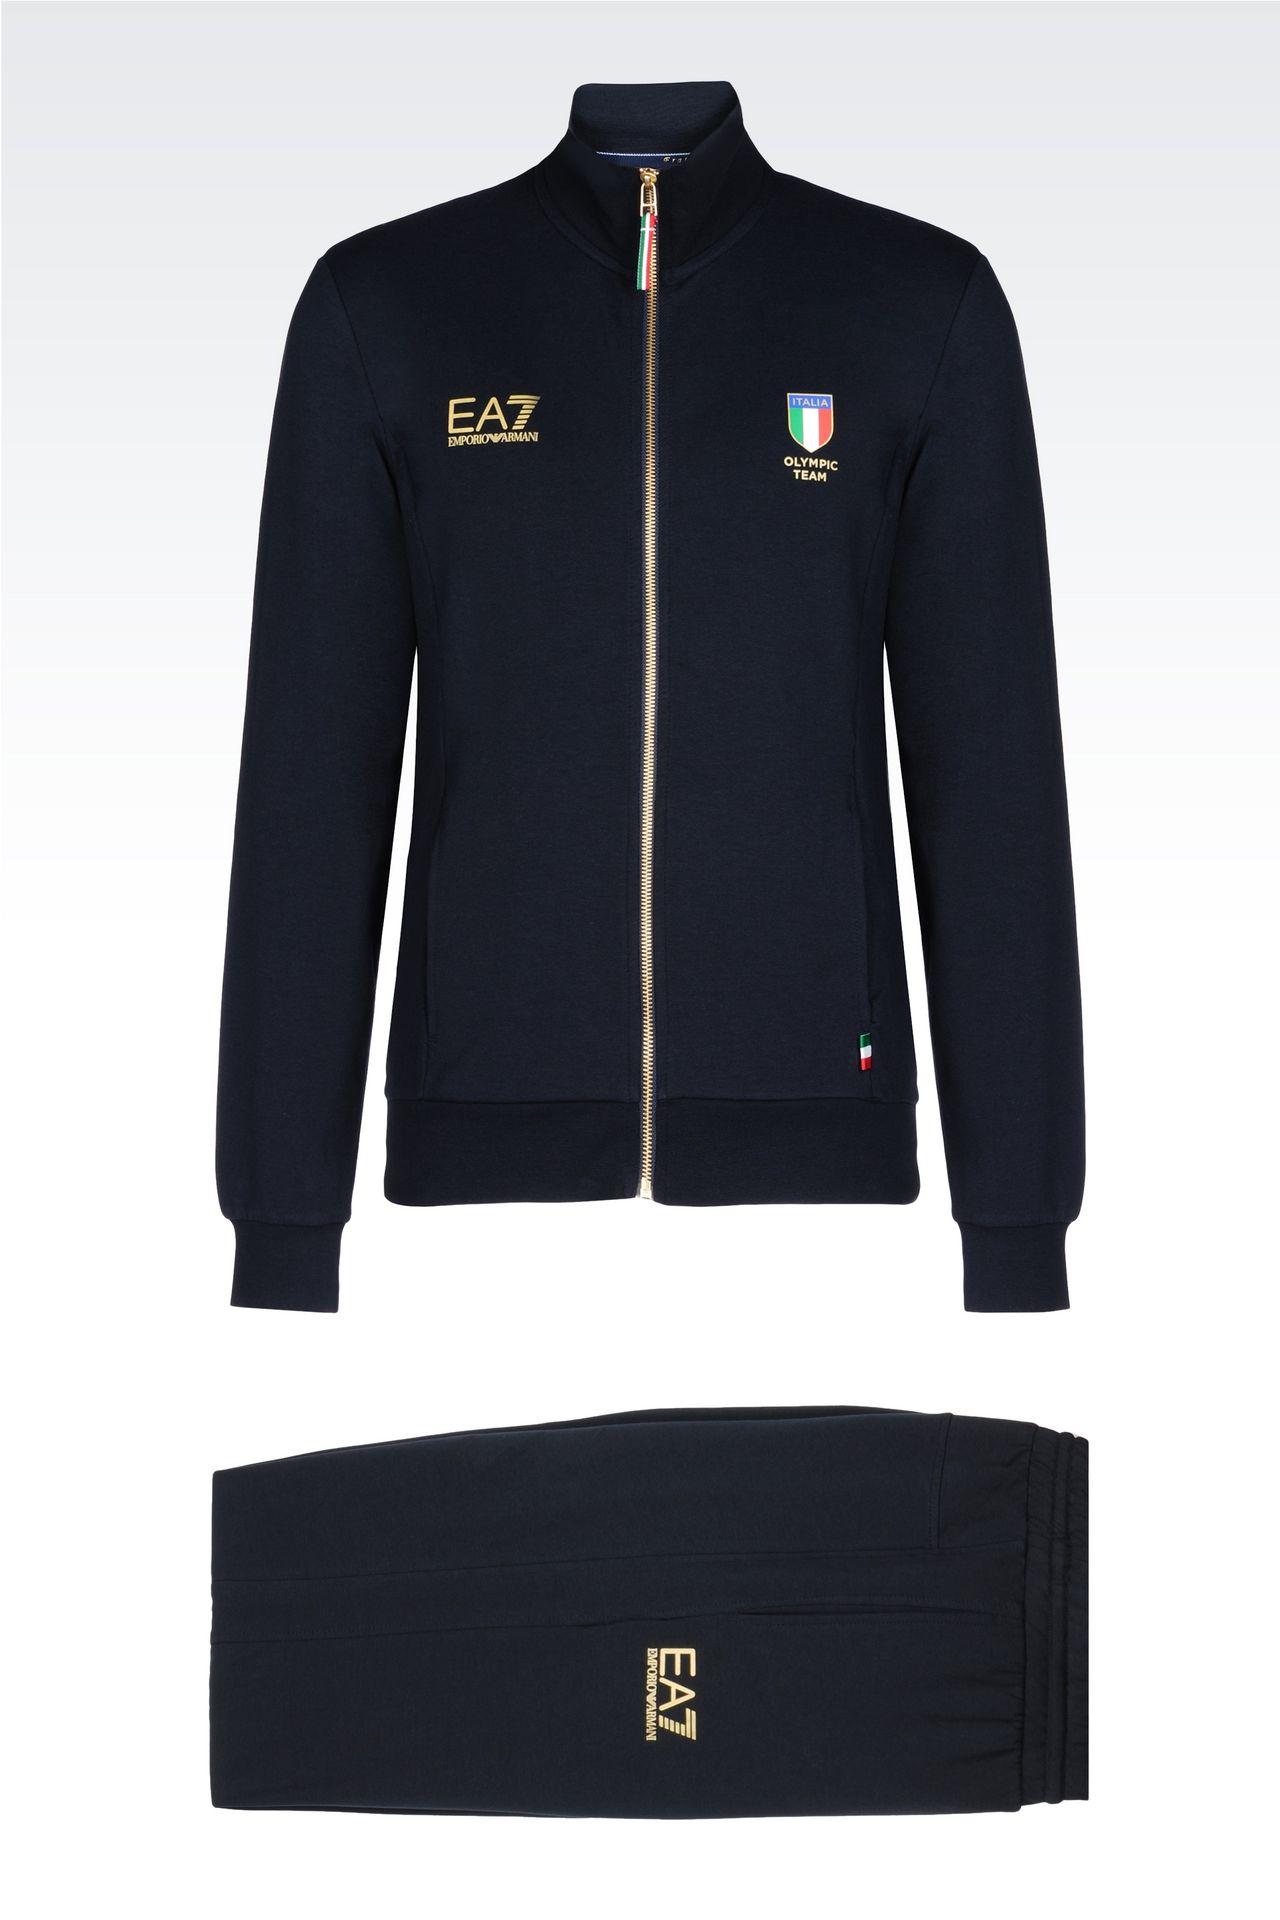 3da9335bc7e2 armani jeans jacket  ggwfd2 armani italy